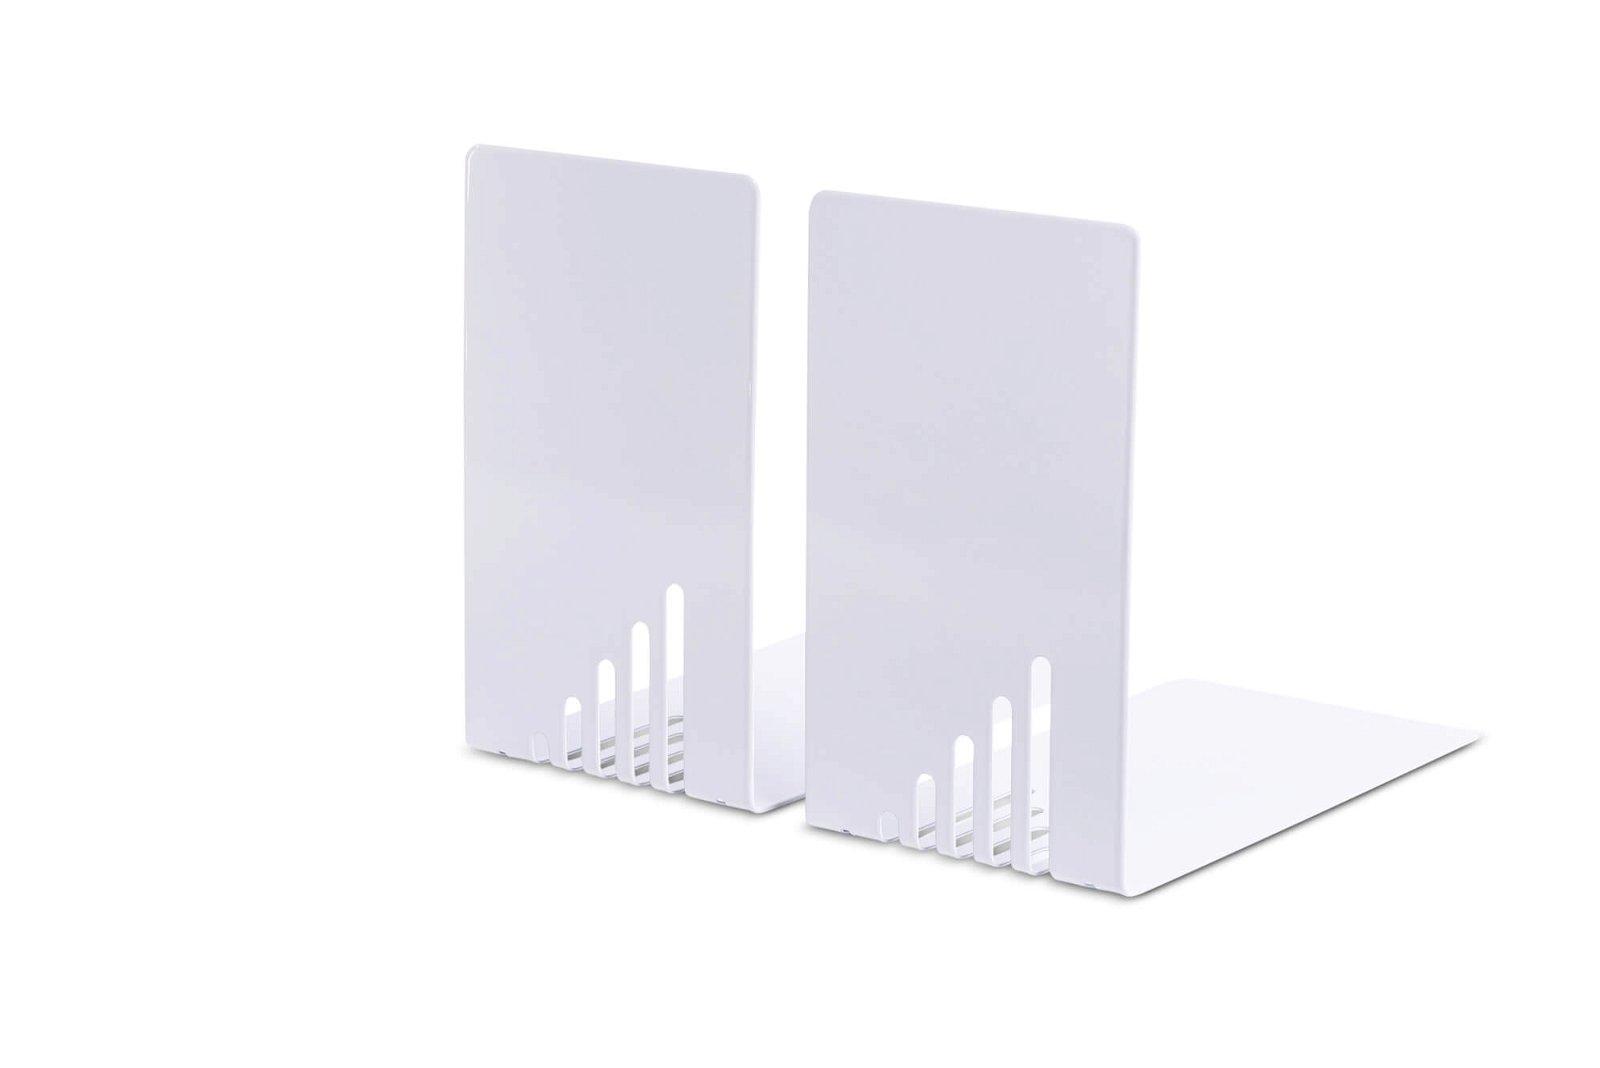 Buchstützen aus Metall, schmal, 14 x 8,5 x 14 cm, grau